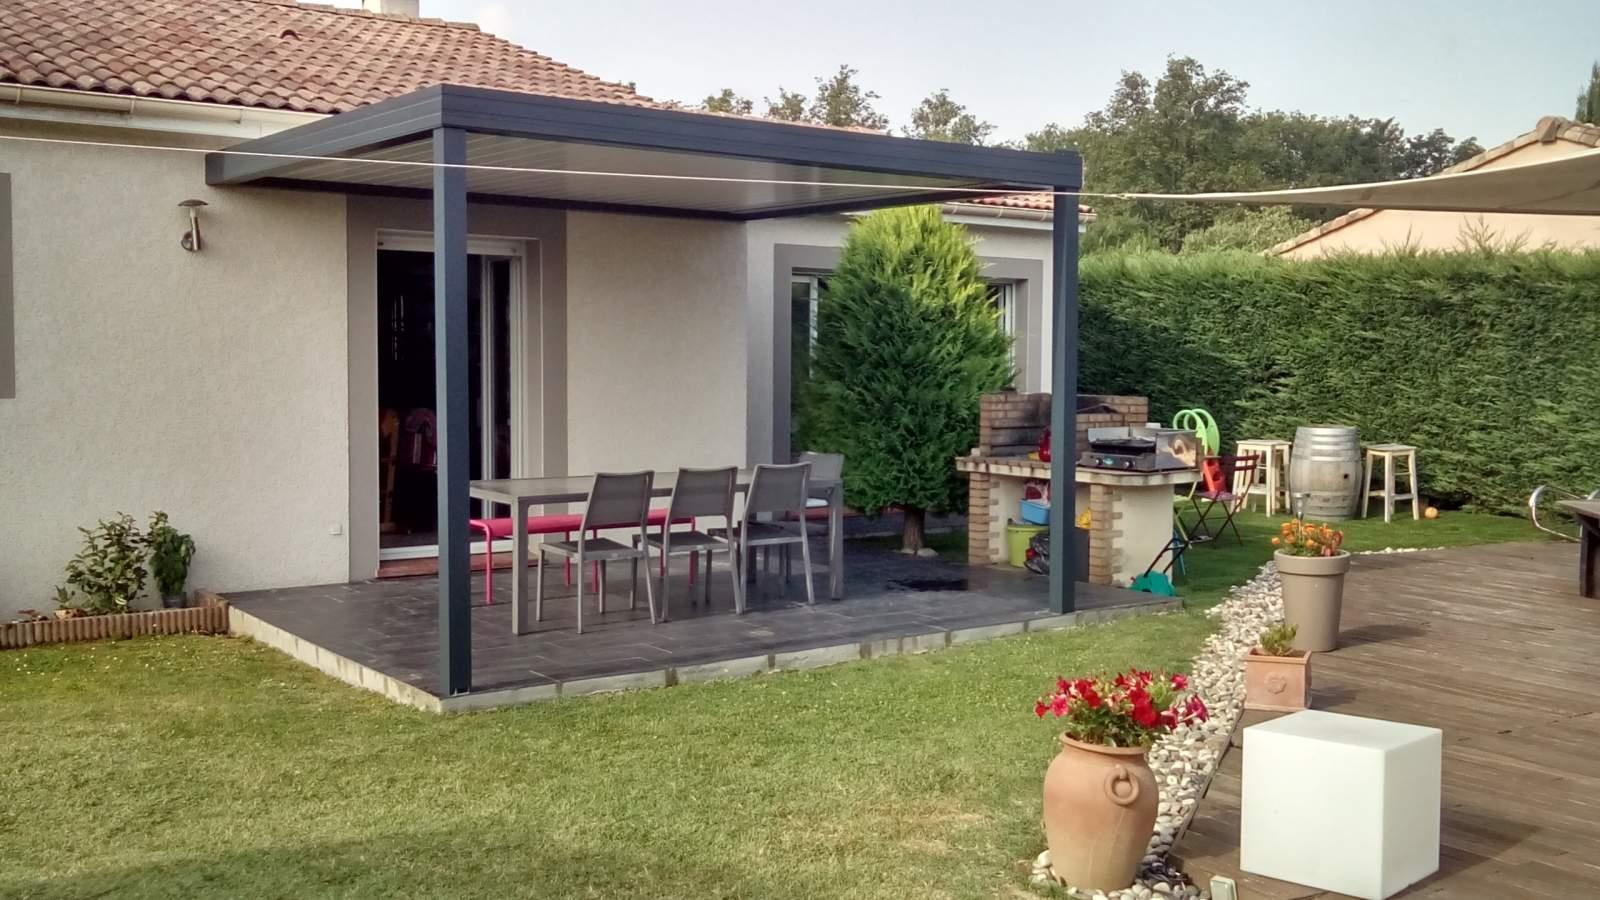 pergolas bio climatique aluminium toulouse fabrication et pose de portail volets et pergola. Black Bedroom Furniture Sets. Home Design Ideas